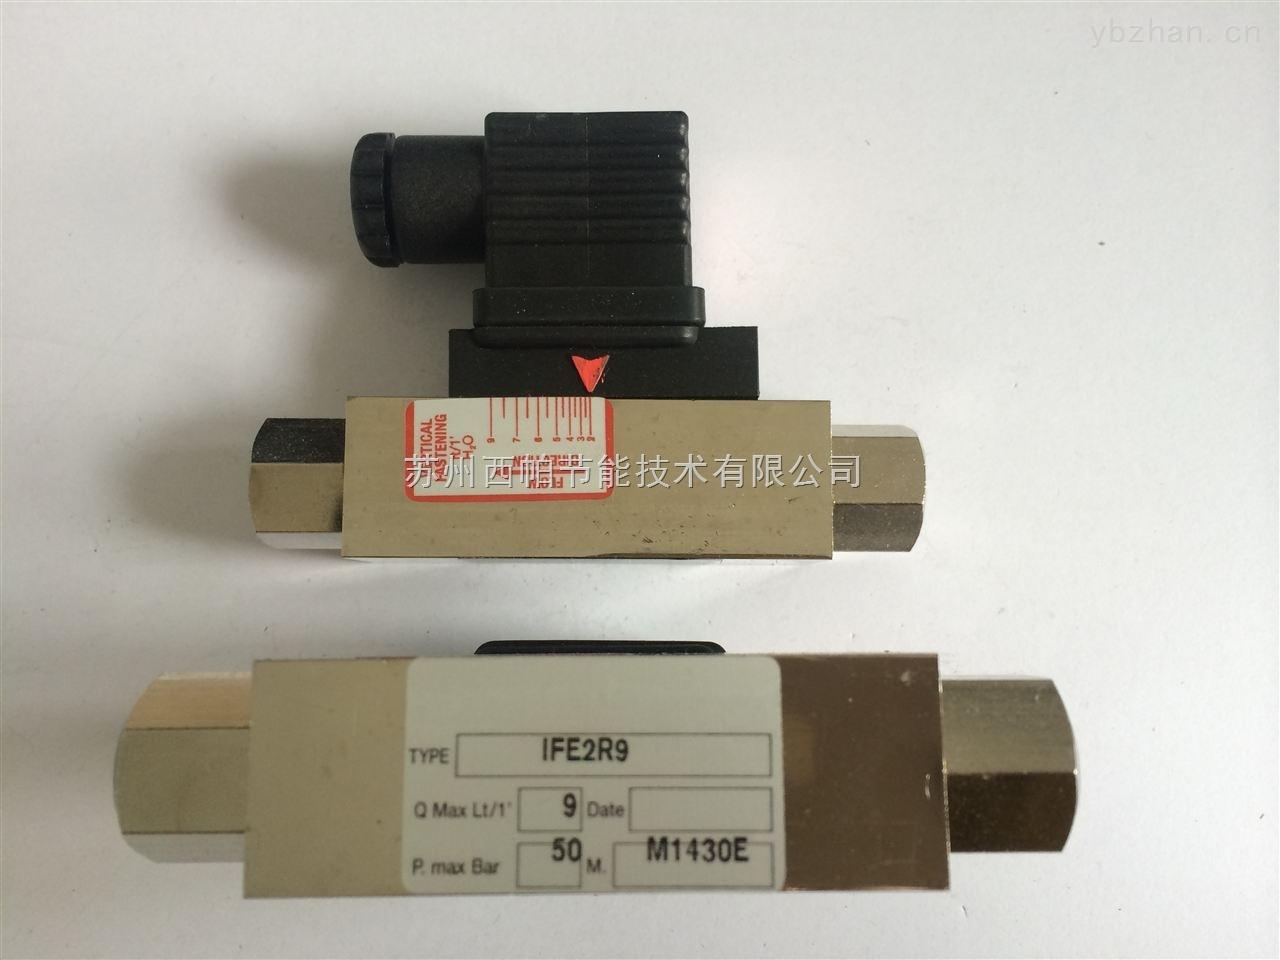 IFE4R24-伊莱科原装进口elettrotec流量计IFE4R24流量开关